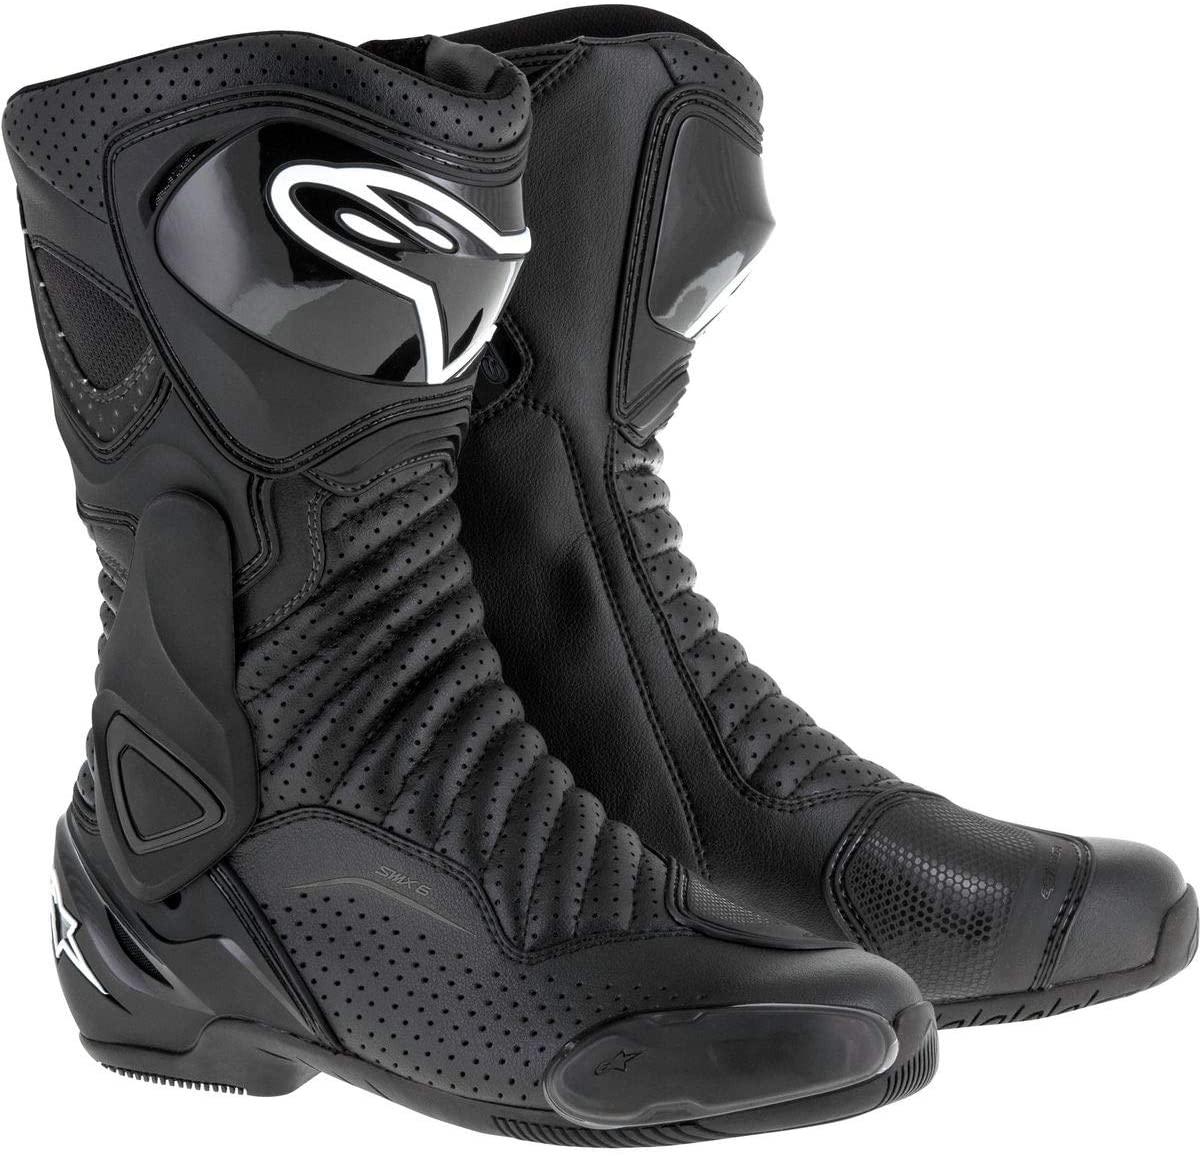 Alpinestars Men's SMX-6 v2 Vented Street Motorcycle Boot, Black, 43